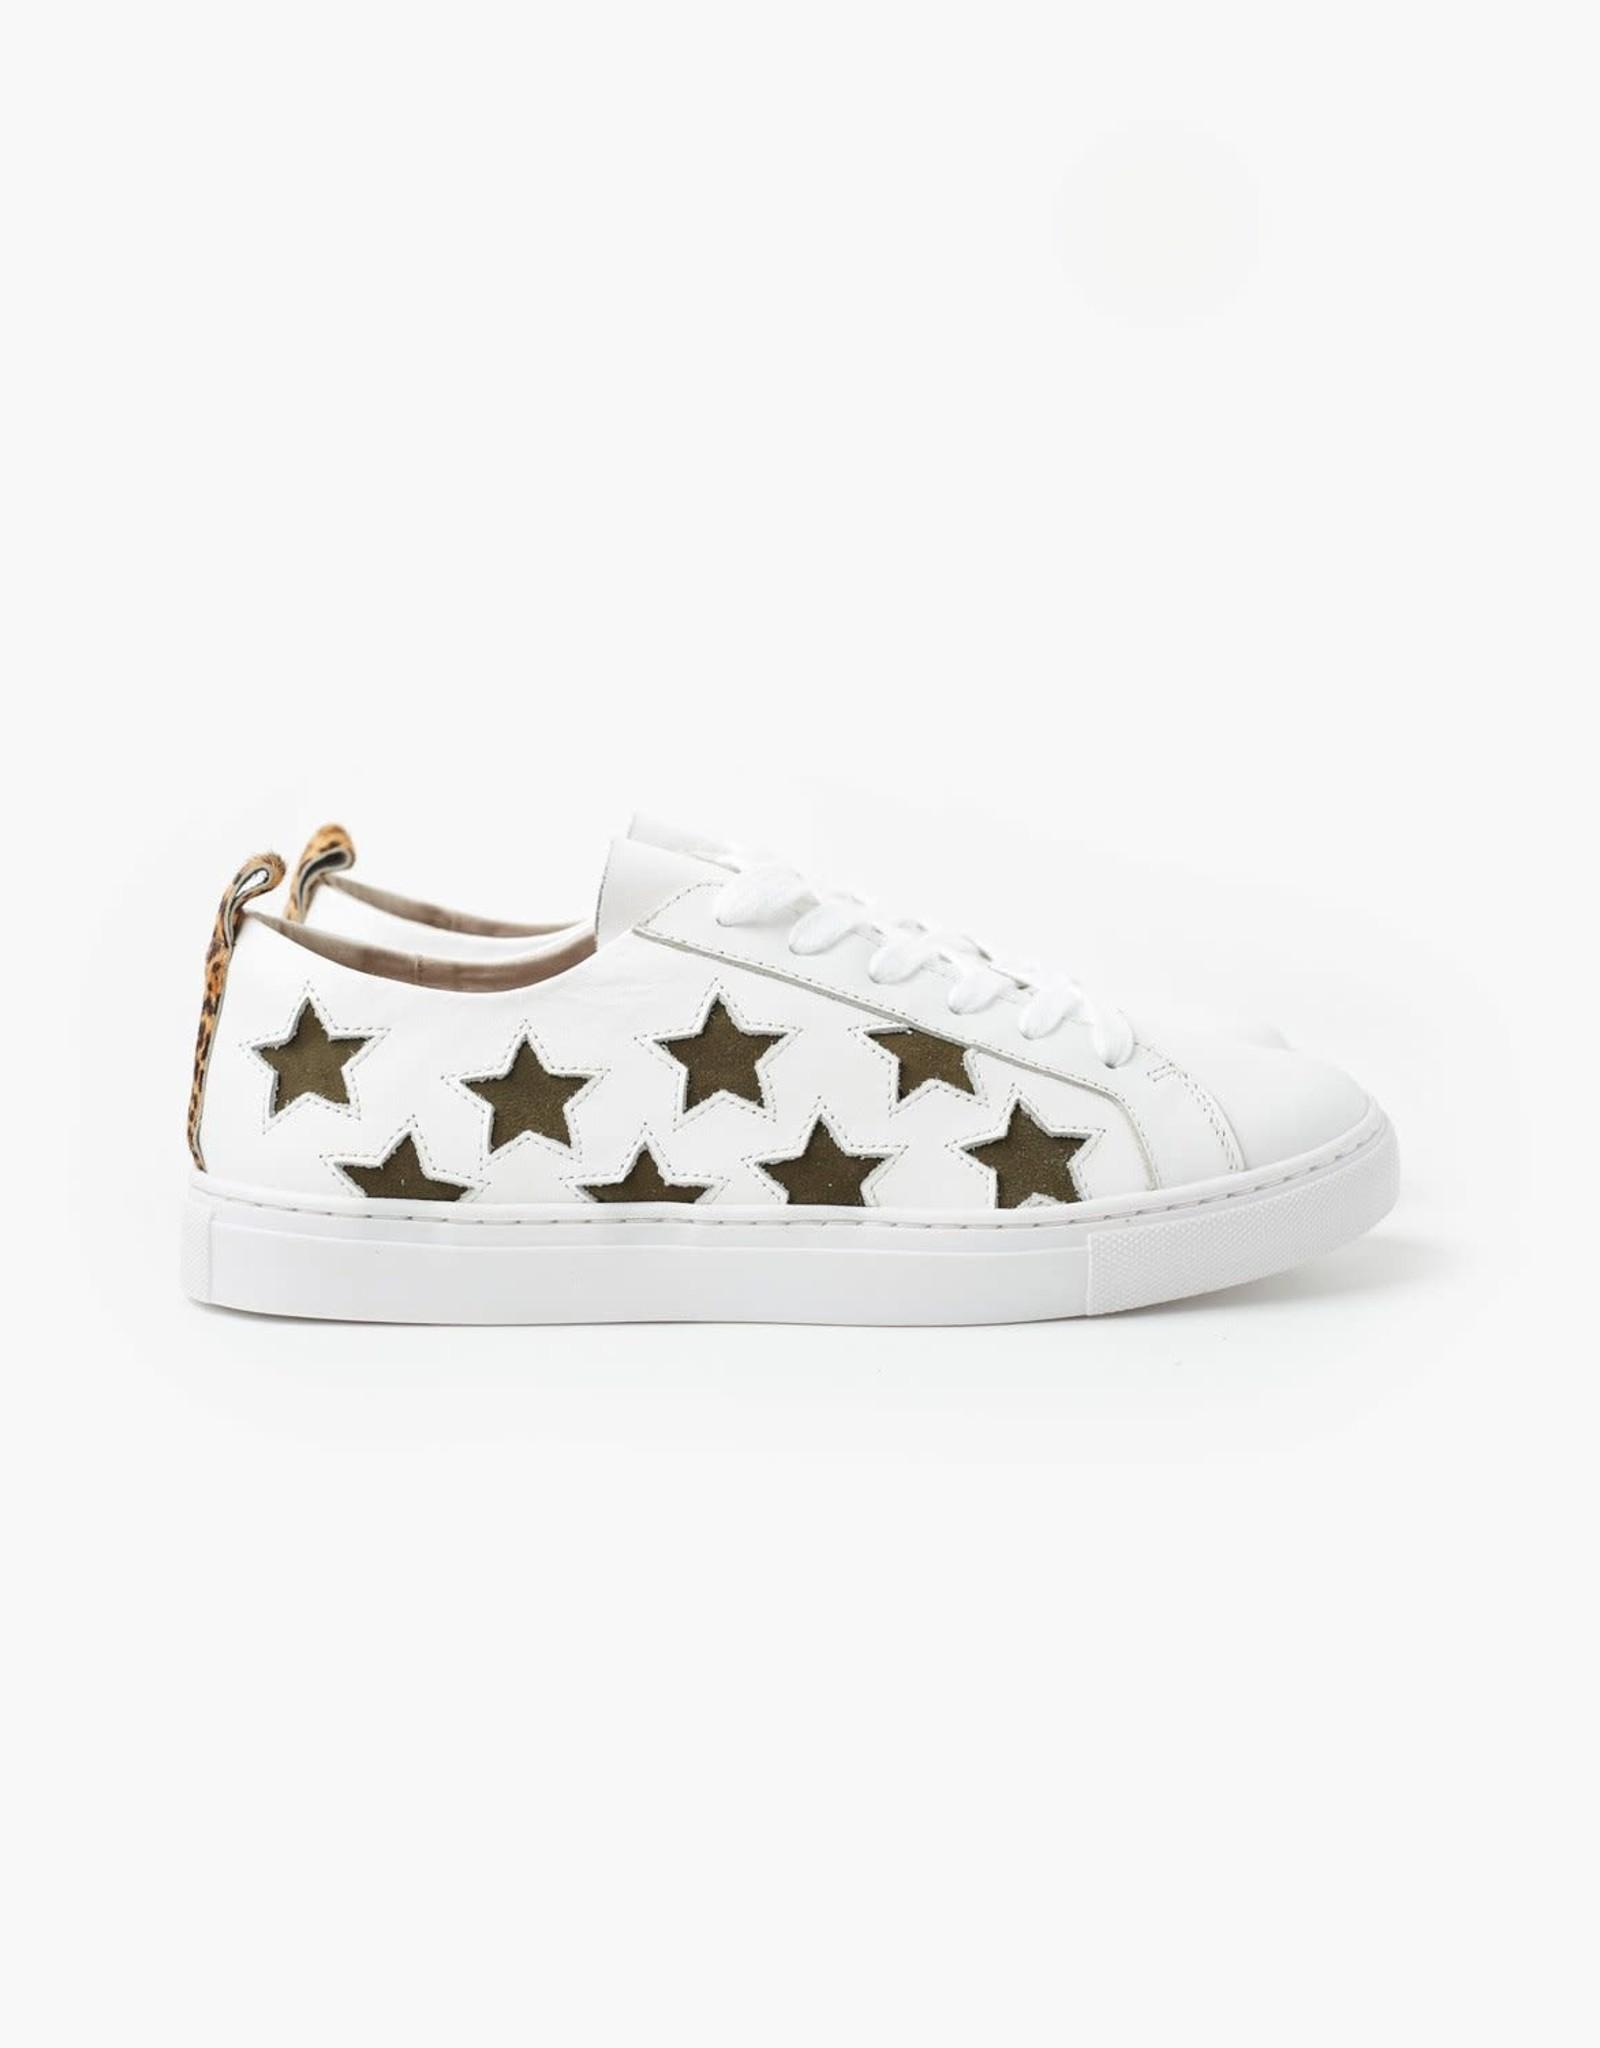 WALNUT HAVENW21 Haven Star Leather Sneaker